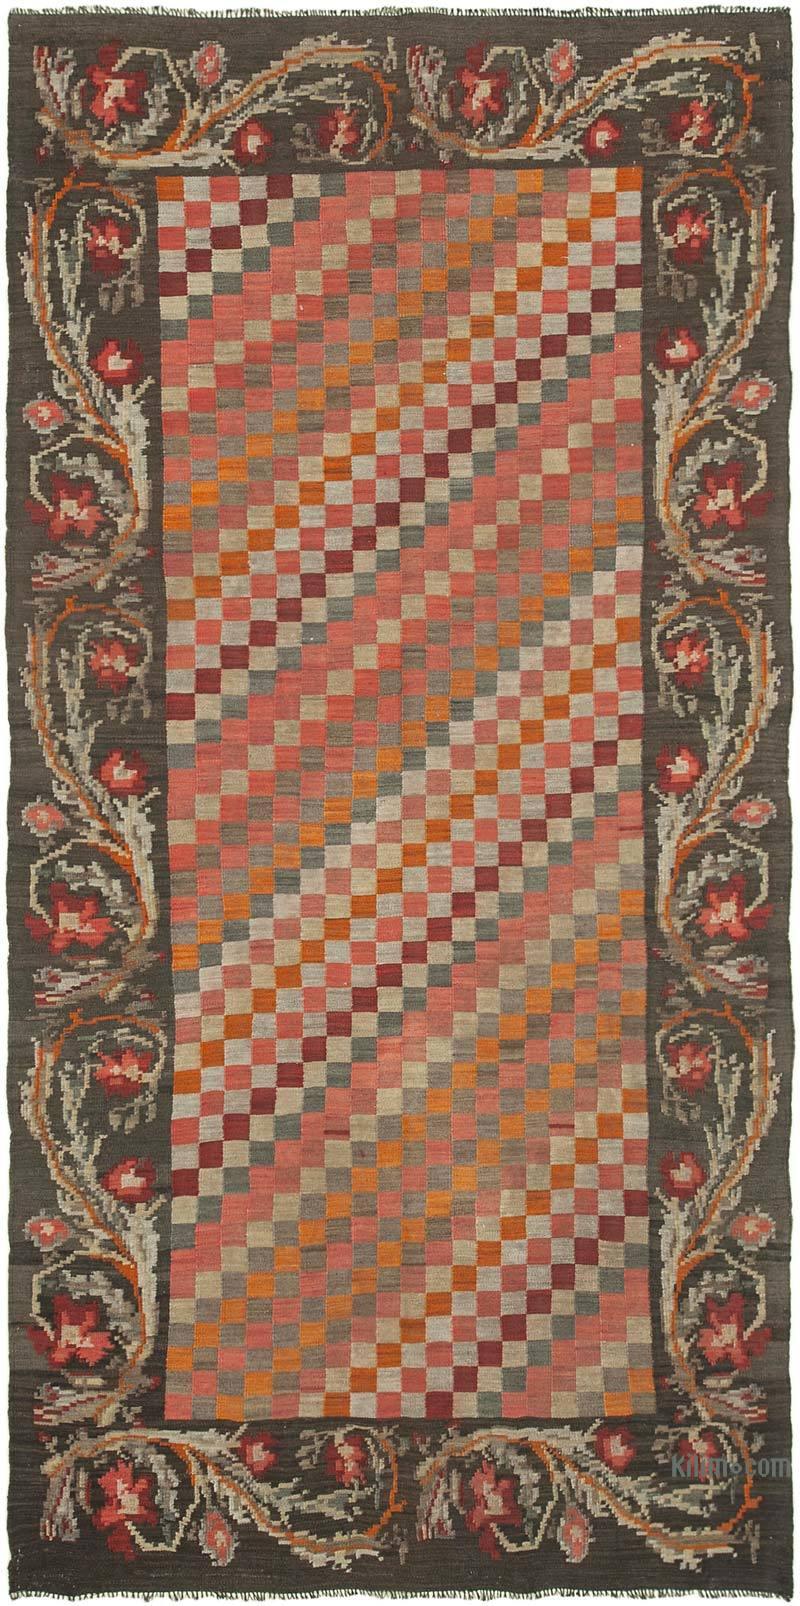 Çok Renkli Vintage Moldova Kilimi - 160 cm x 306 cm - K0039092